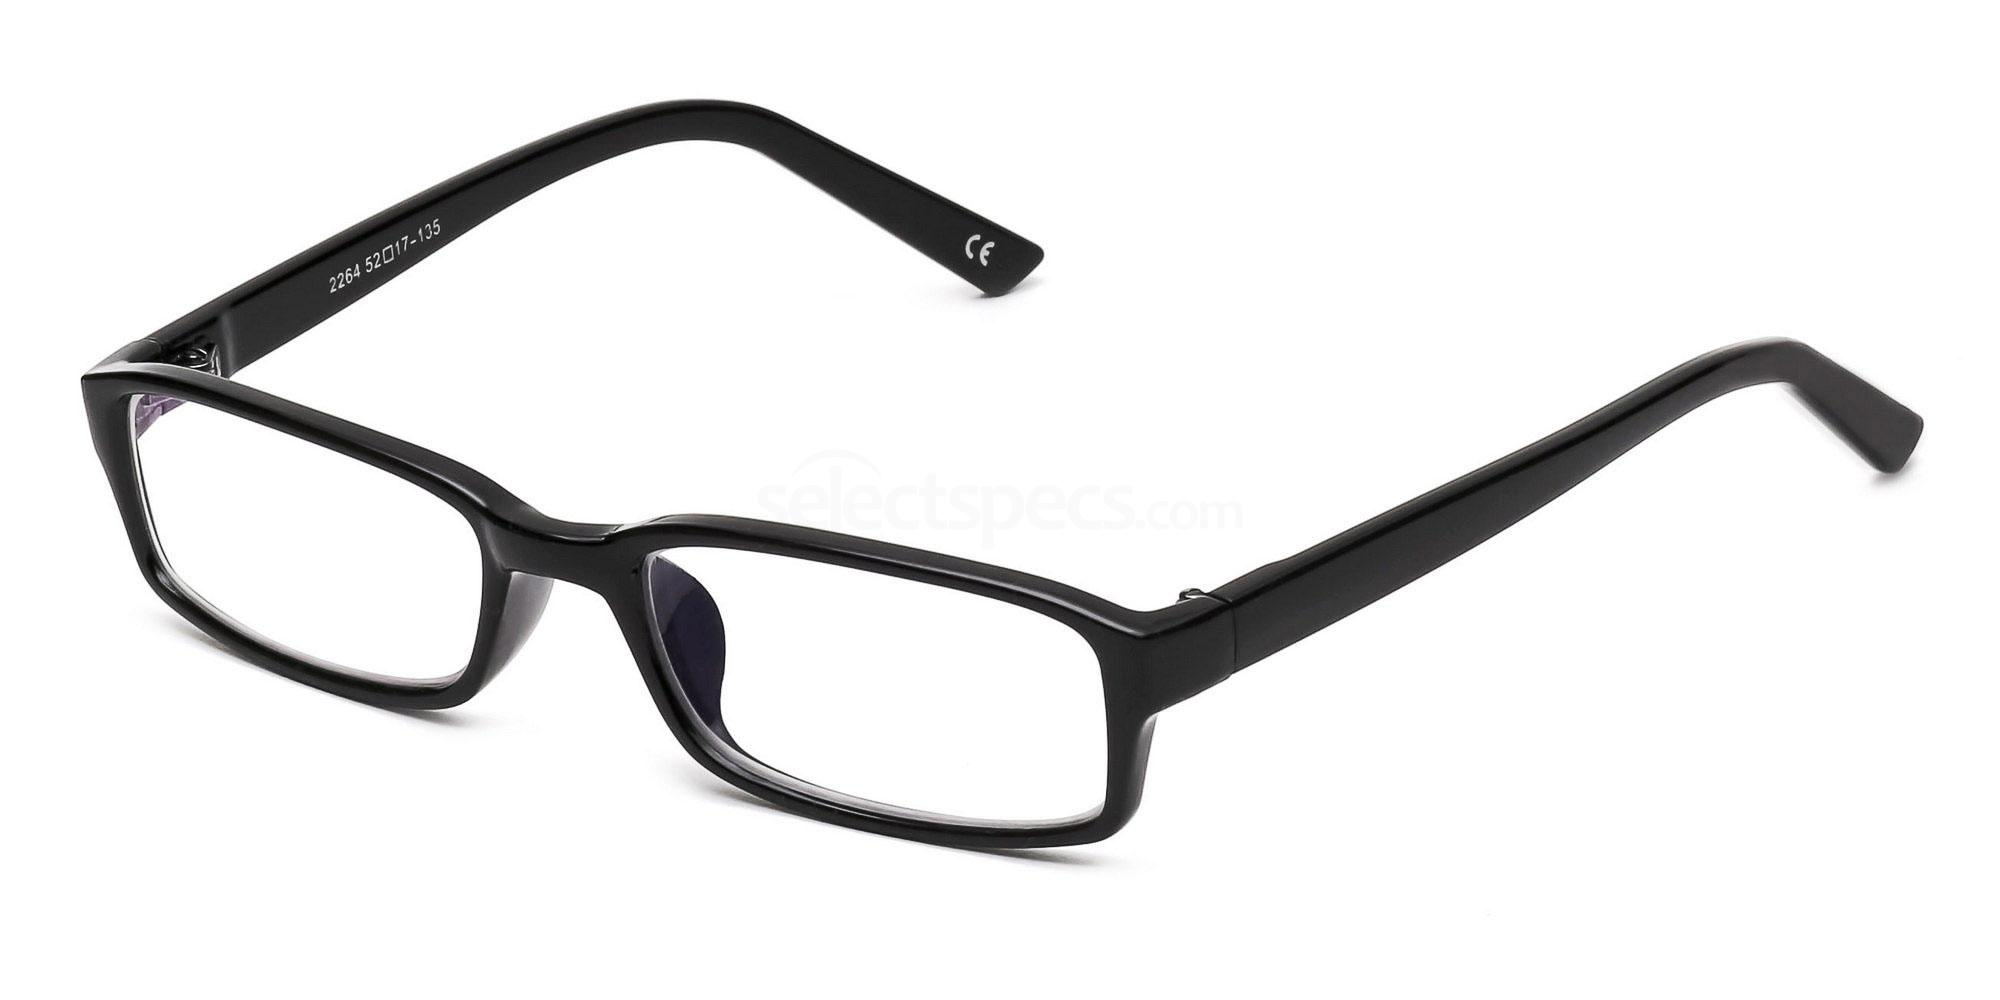 Savannah 2264 prescription glasses